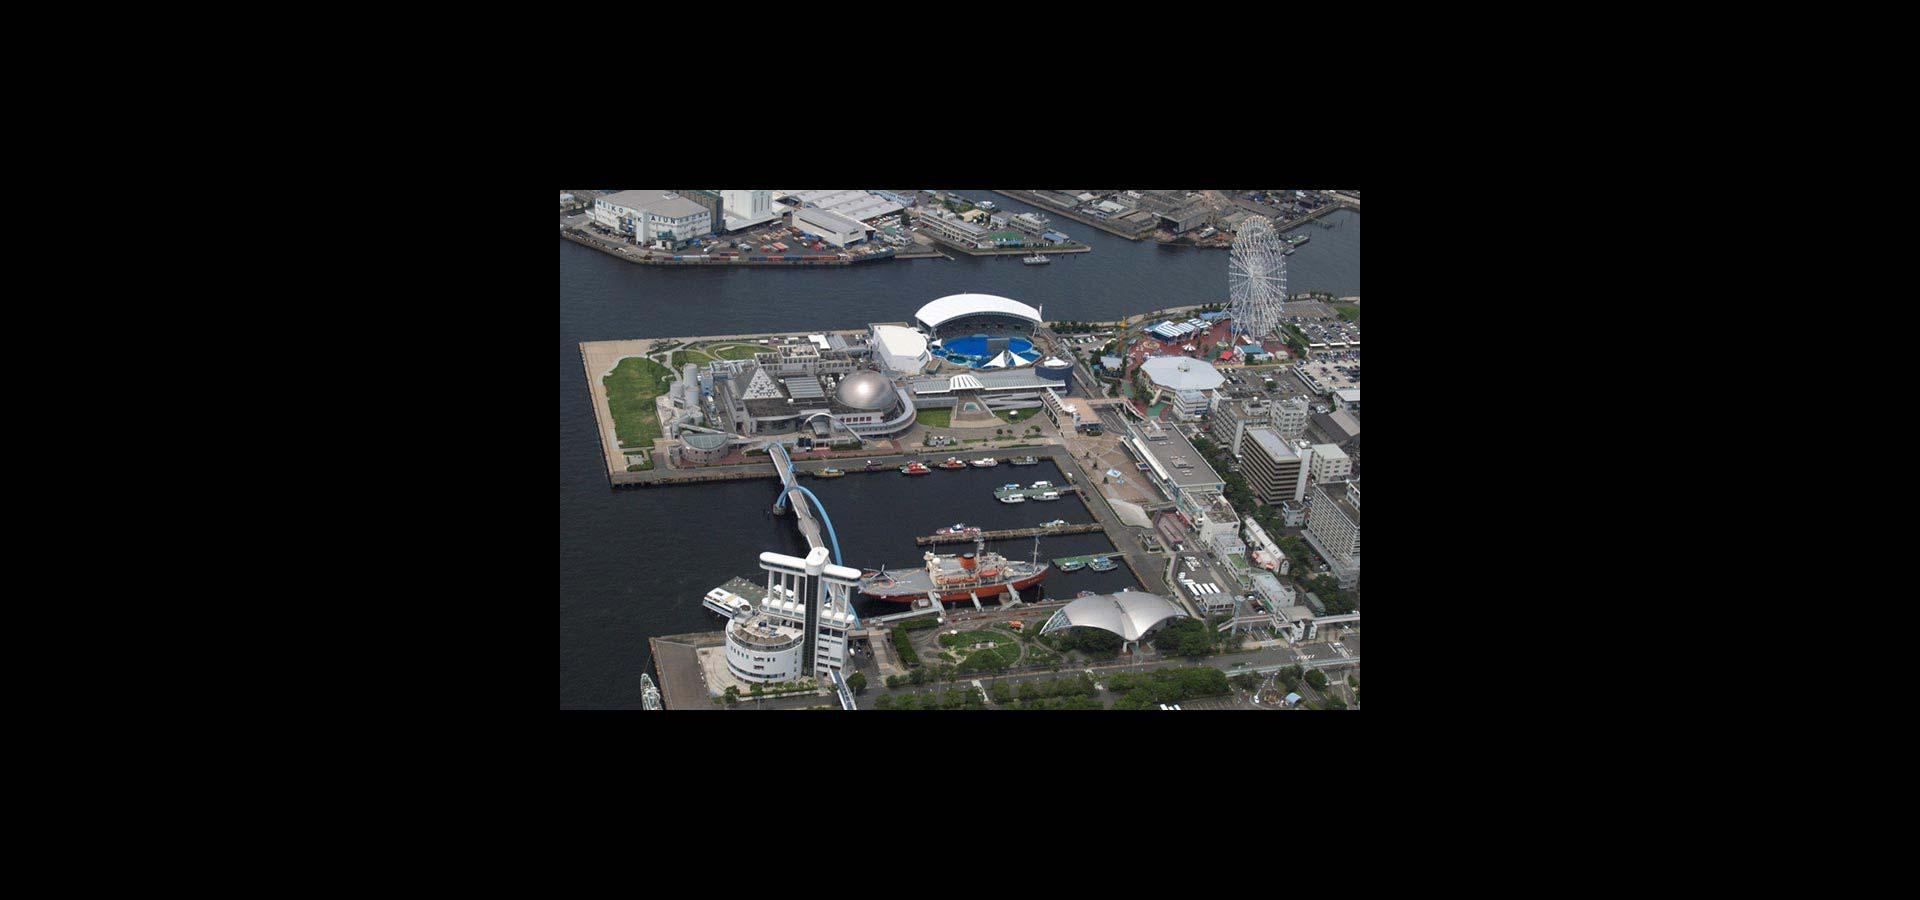 Port of Nagoya Garden Wharf